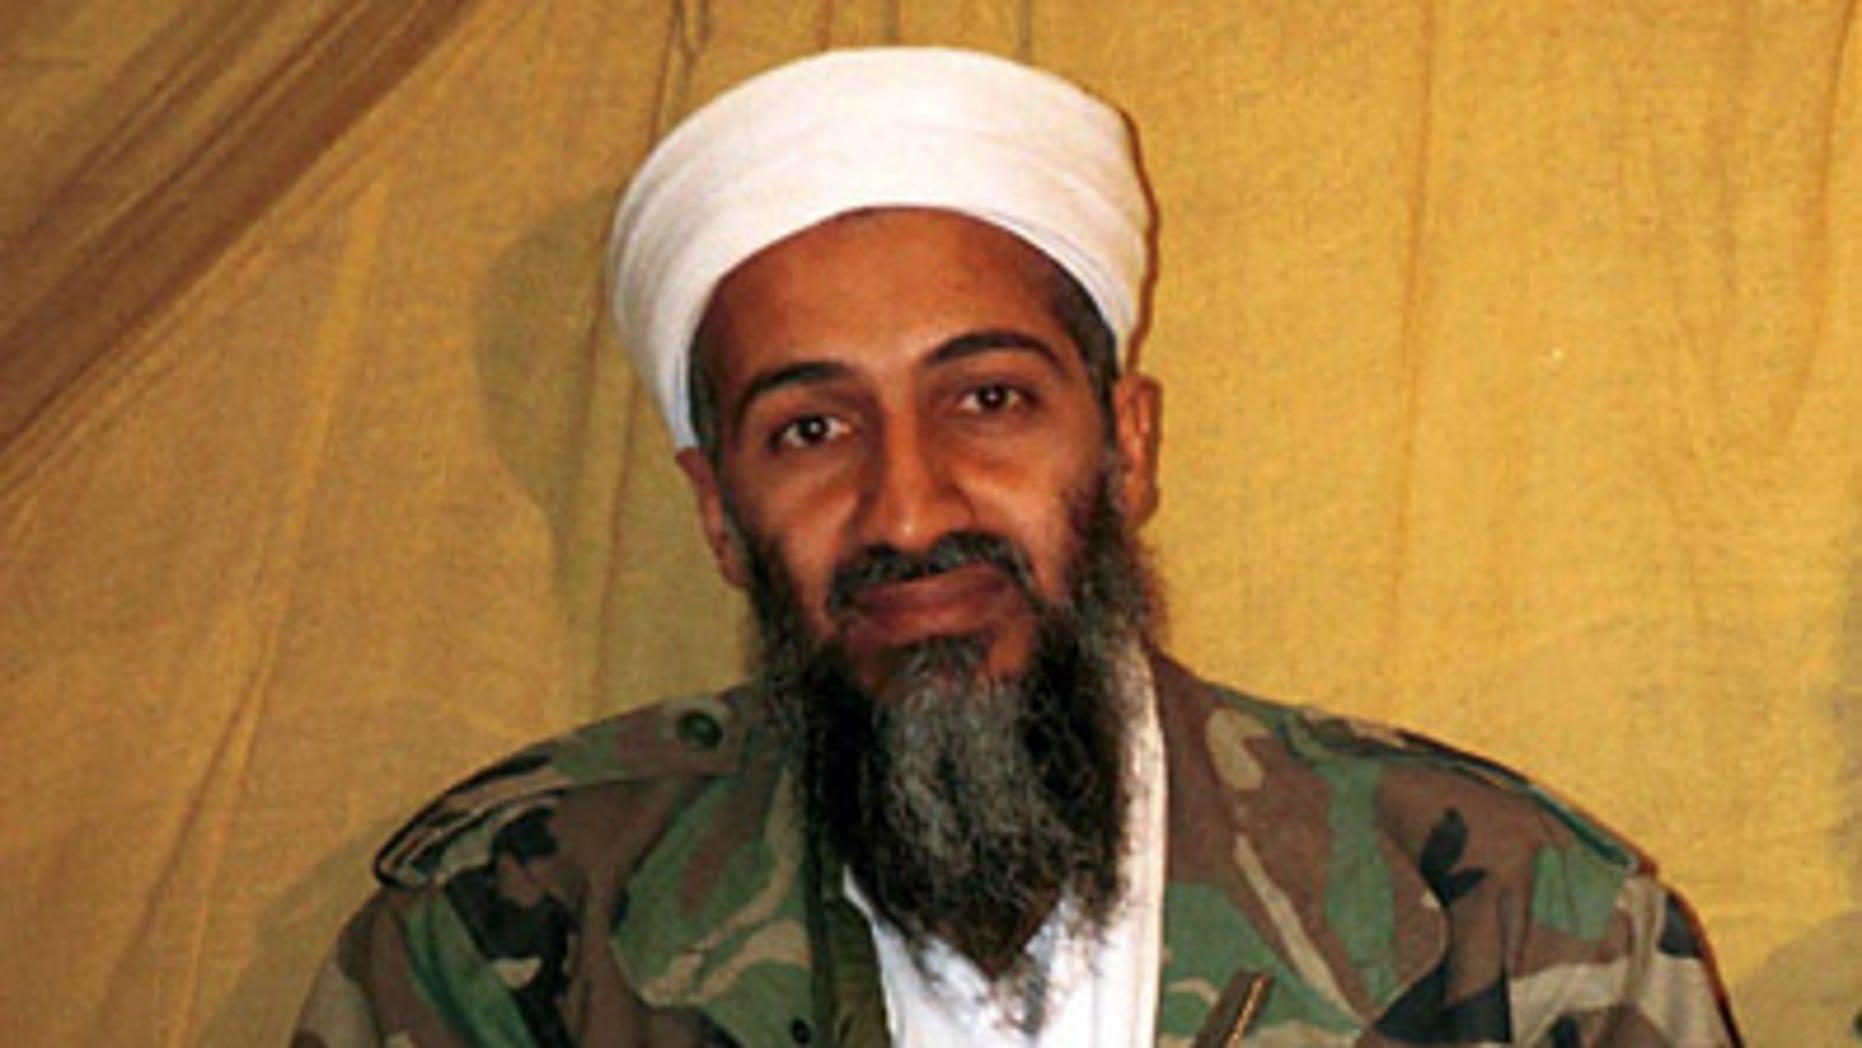 FILE: Undated: Al Qaeda leader Usama bin Laden, in Afghanistan, before being killed in May 2011 by U.S. forces.